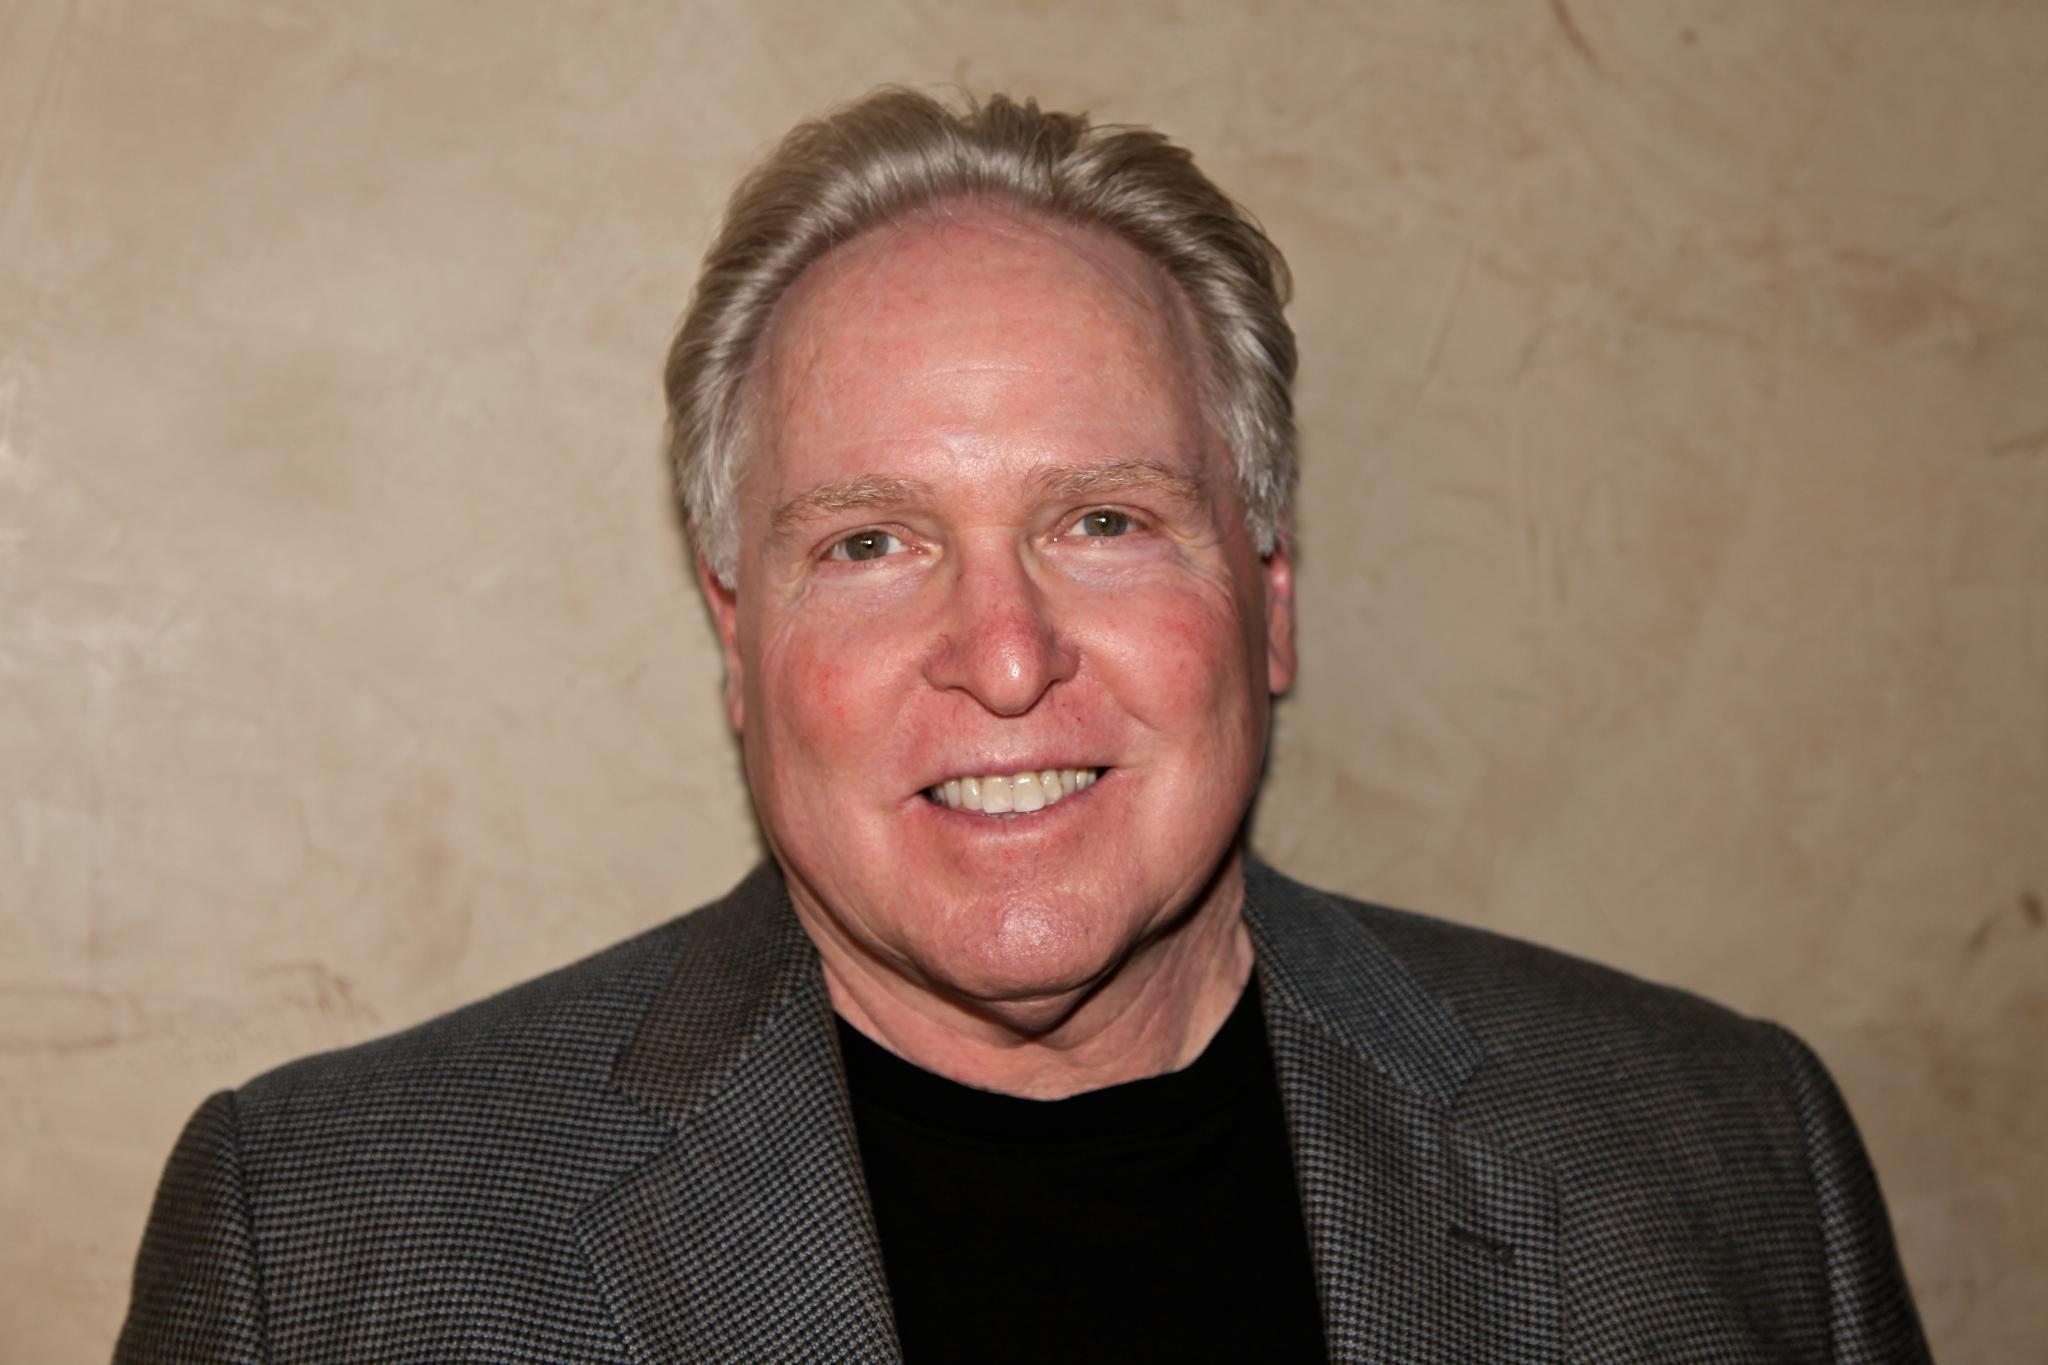 Dr Ken Druck headshot image